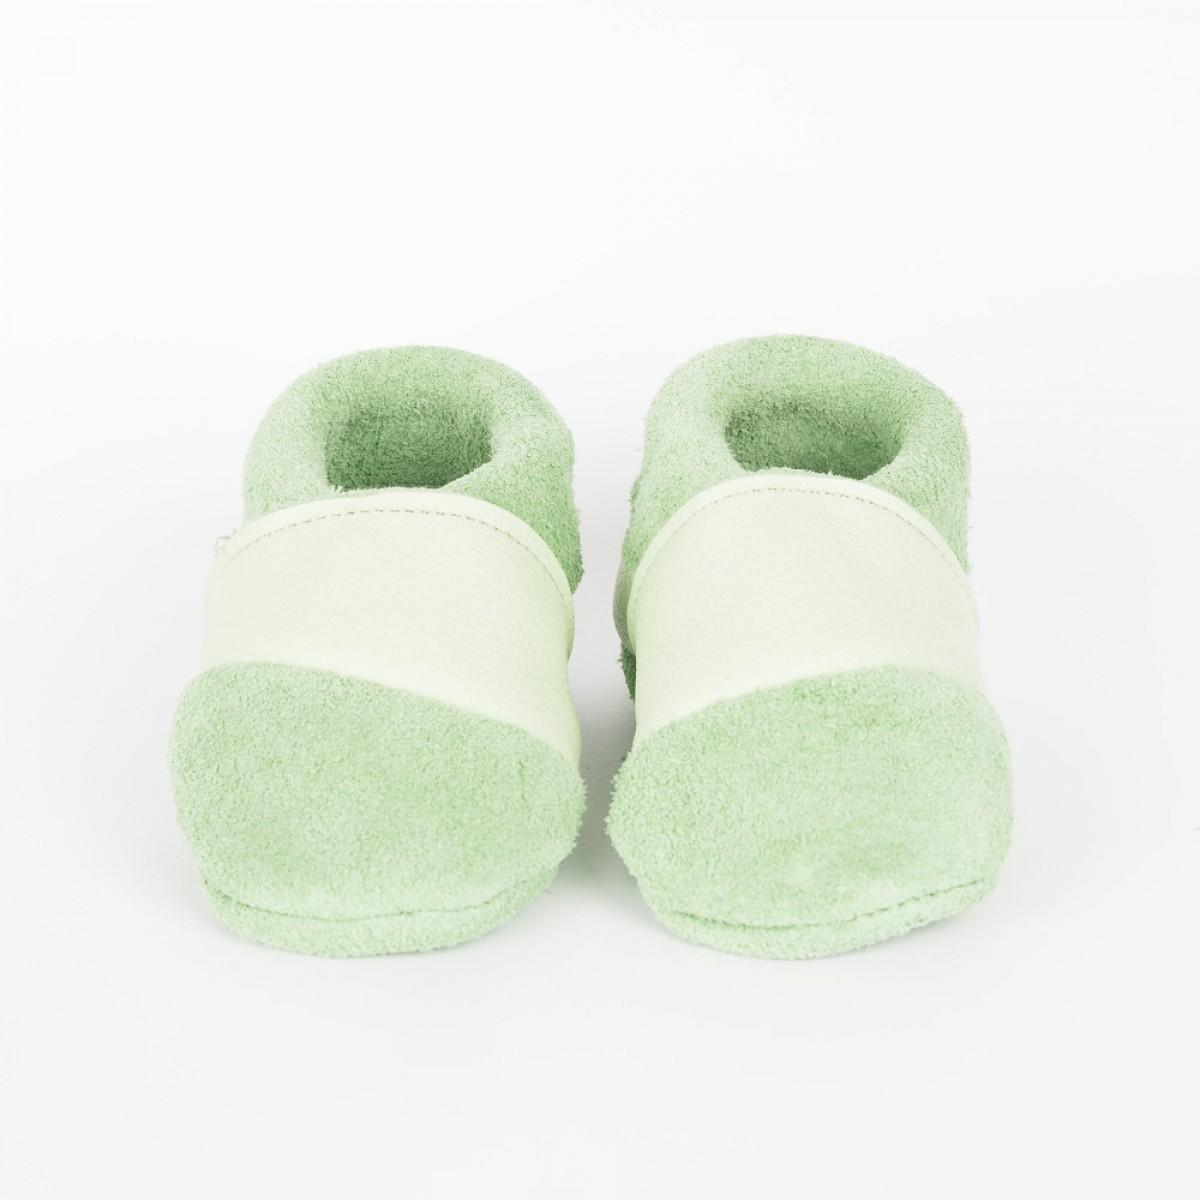 BABYSCHUHE MOQ // Mint